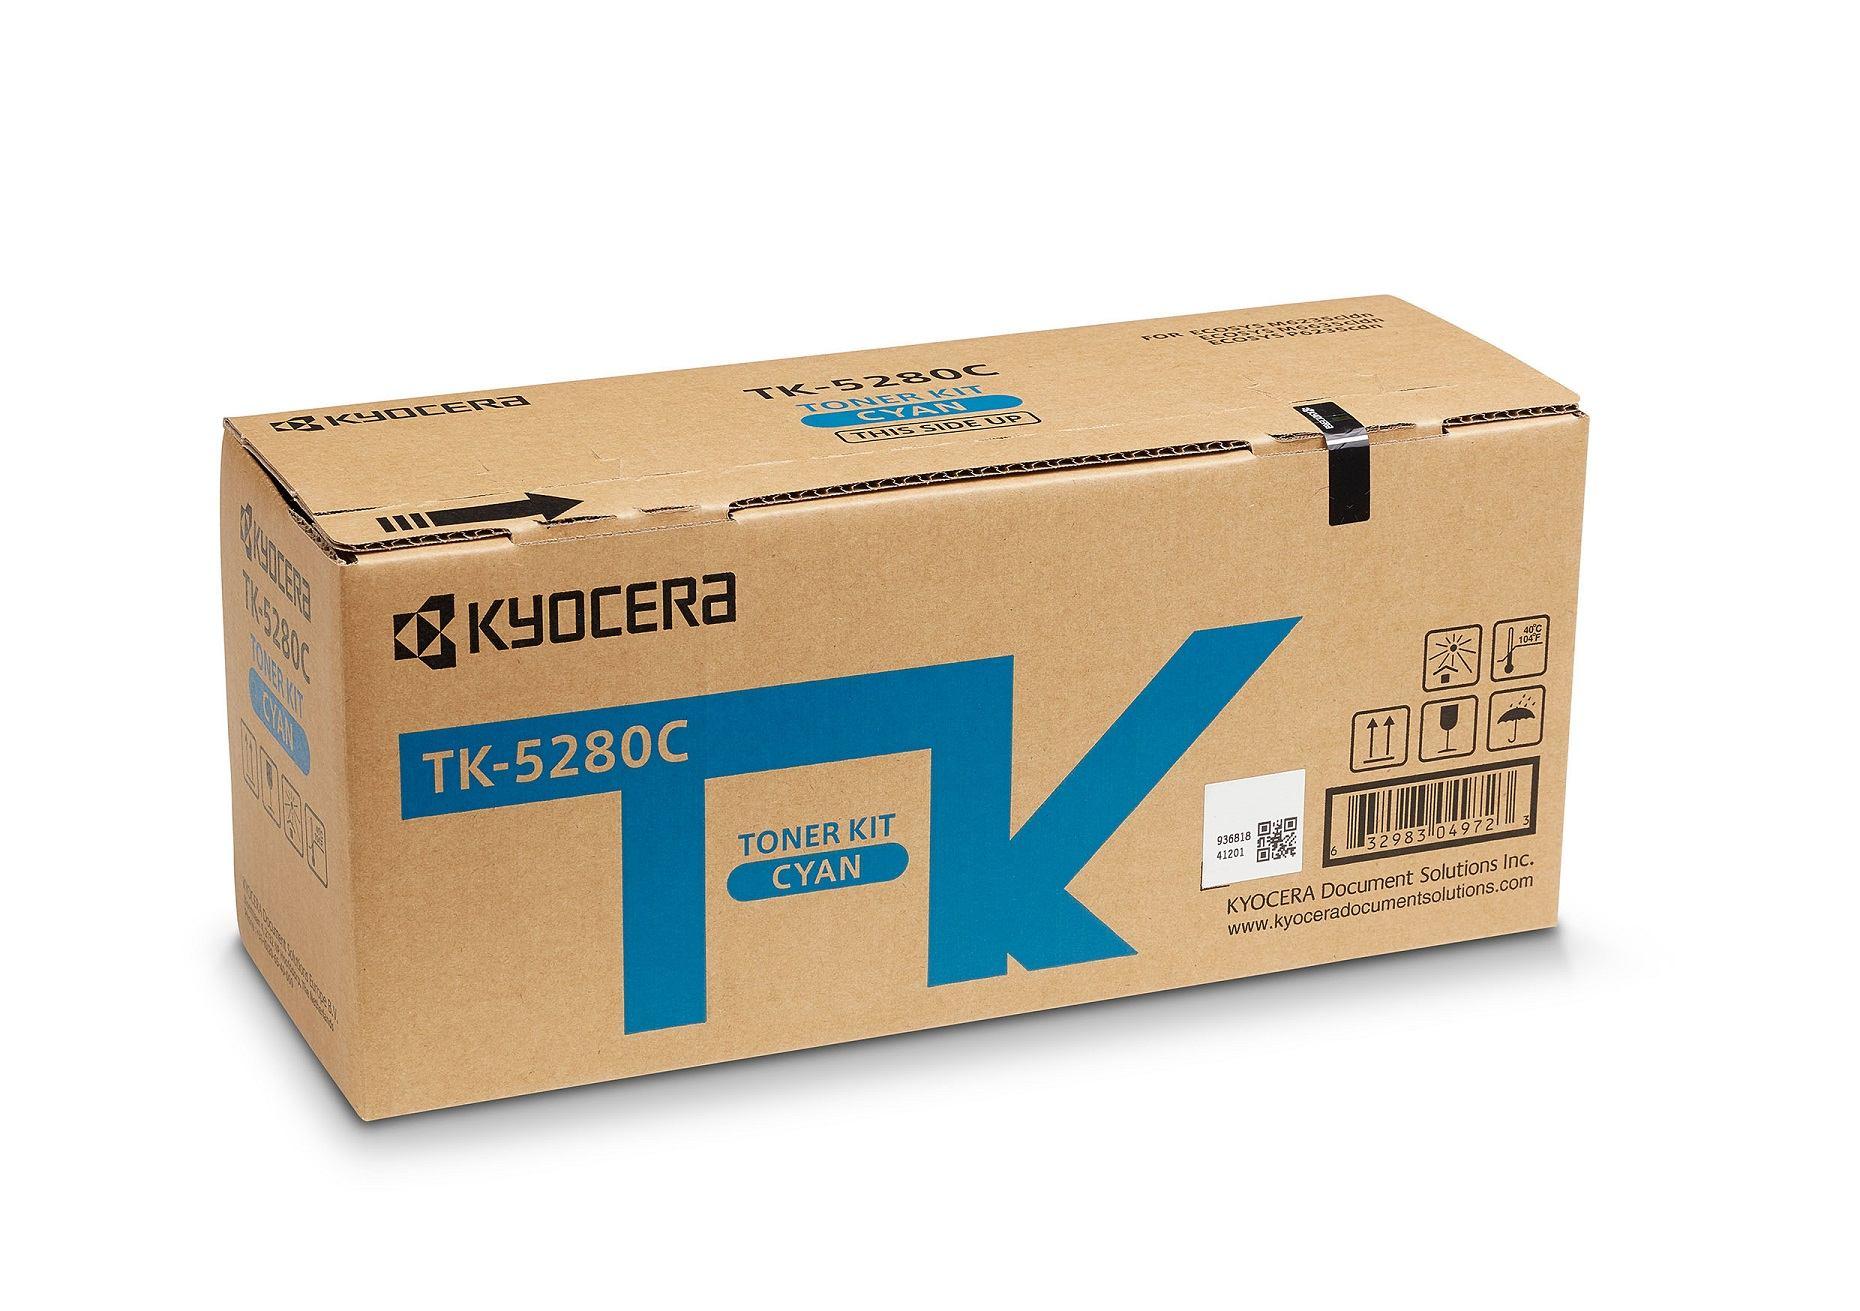 2061337-KYOCERA-TK-5280C-Originale-Ciano-1-pezzo-i-Kyocera-Cyan-Toner-M6235-M6